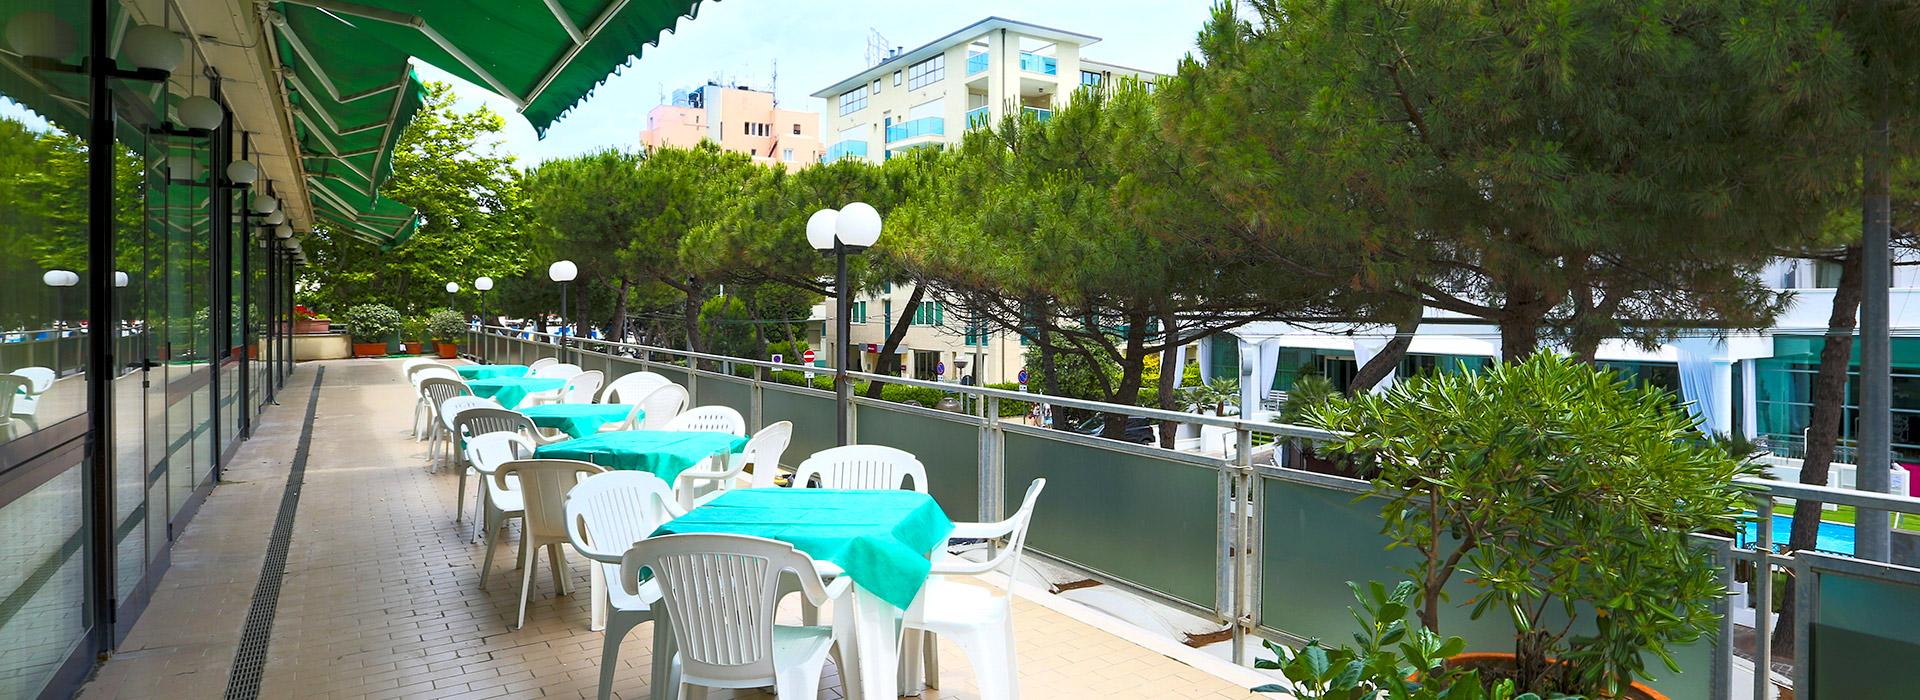 Hotel Europa Riviera Romagnola Home